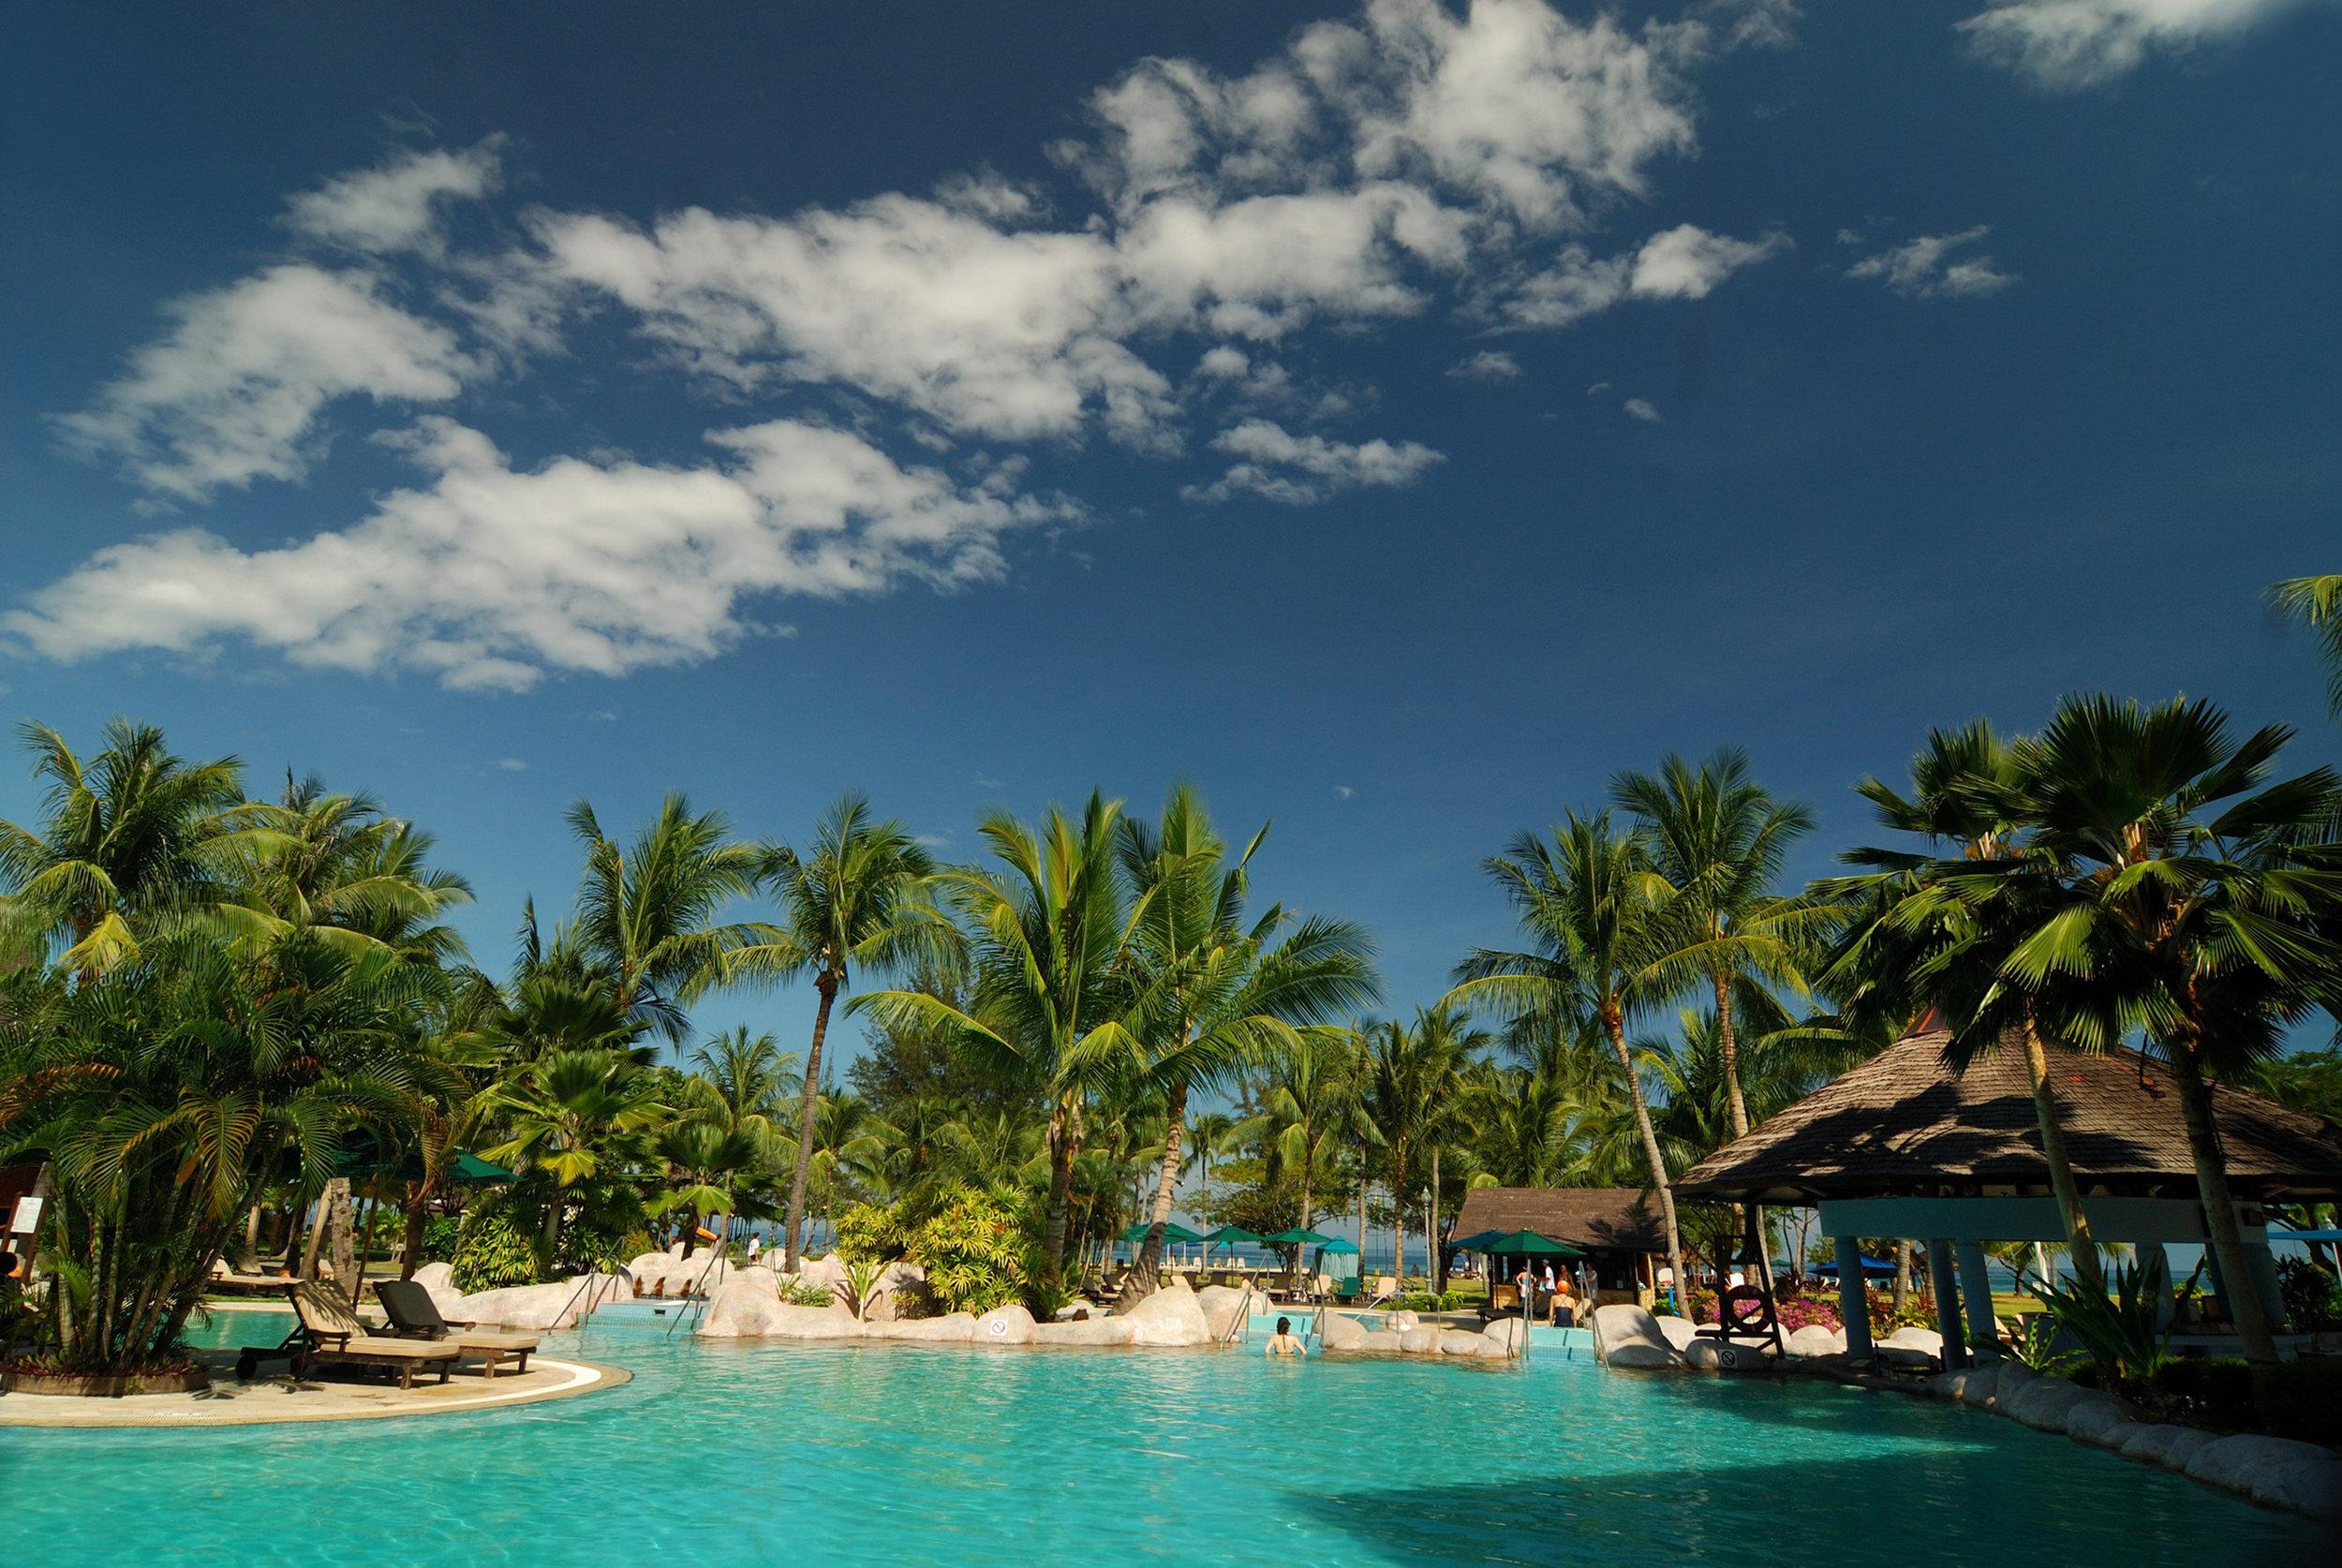 One of several swimming pools at Nexus Resort & Spa